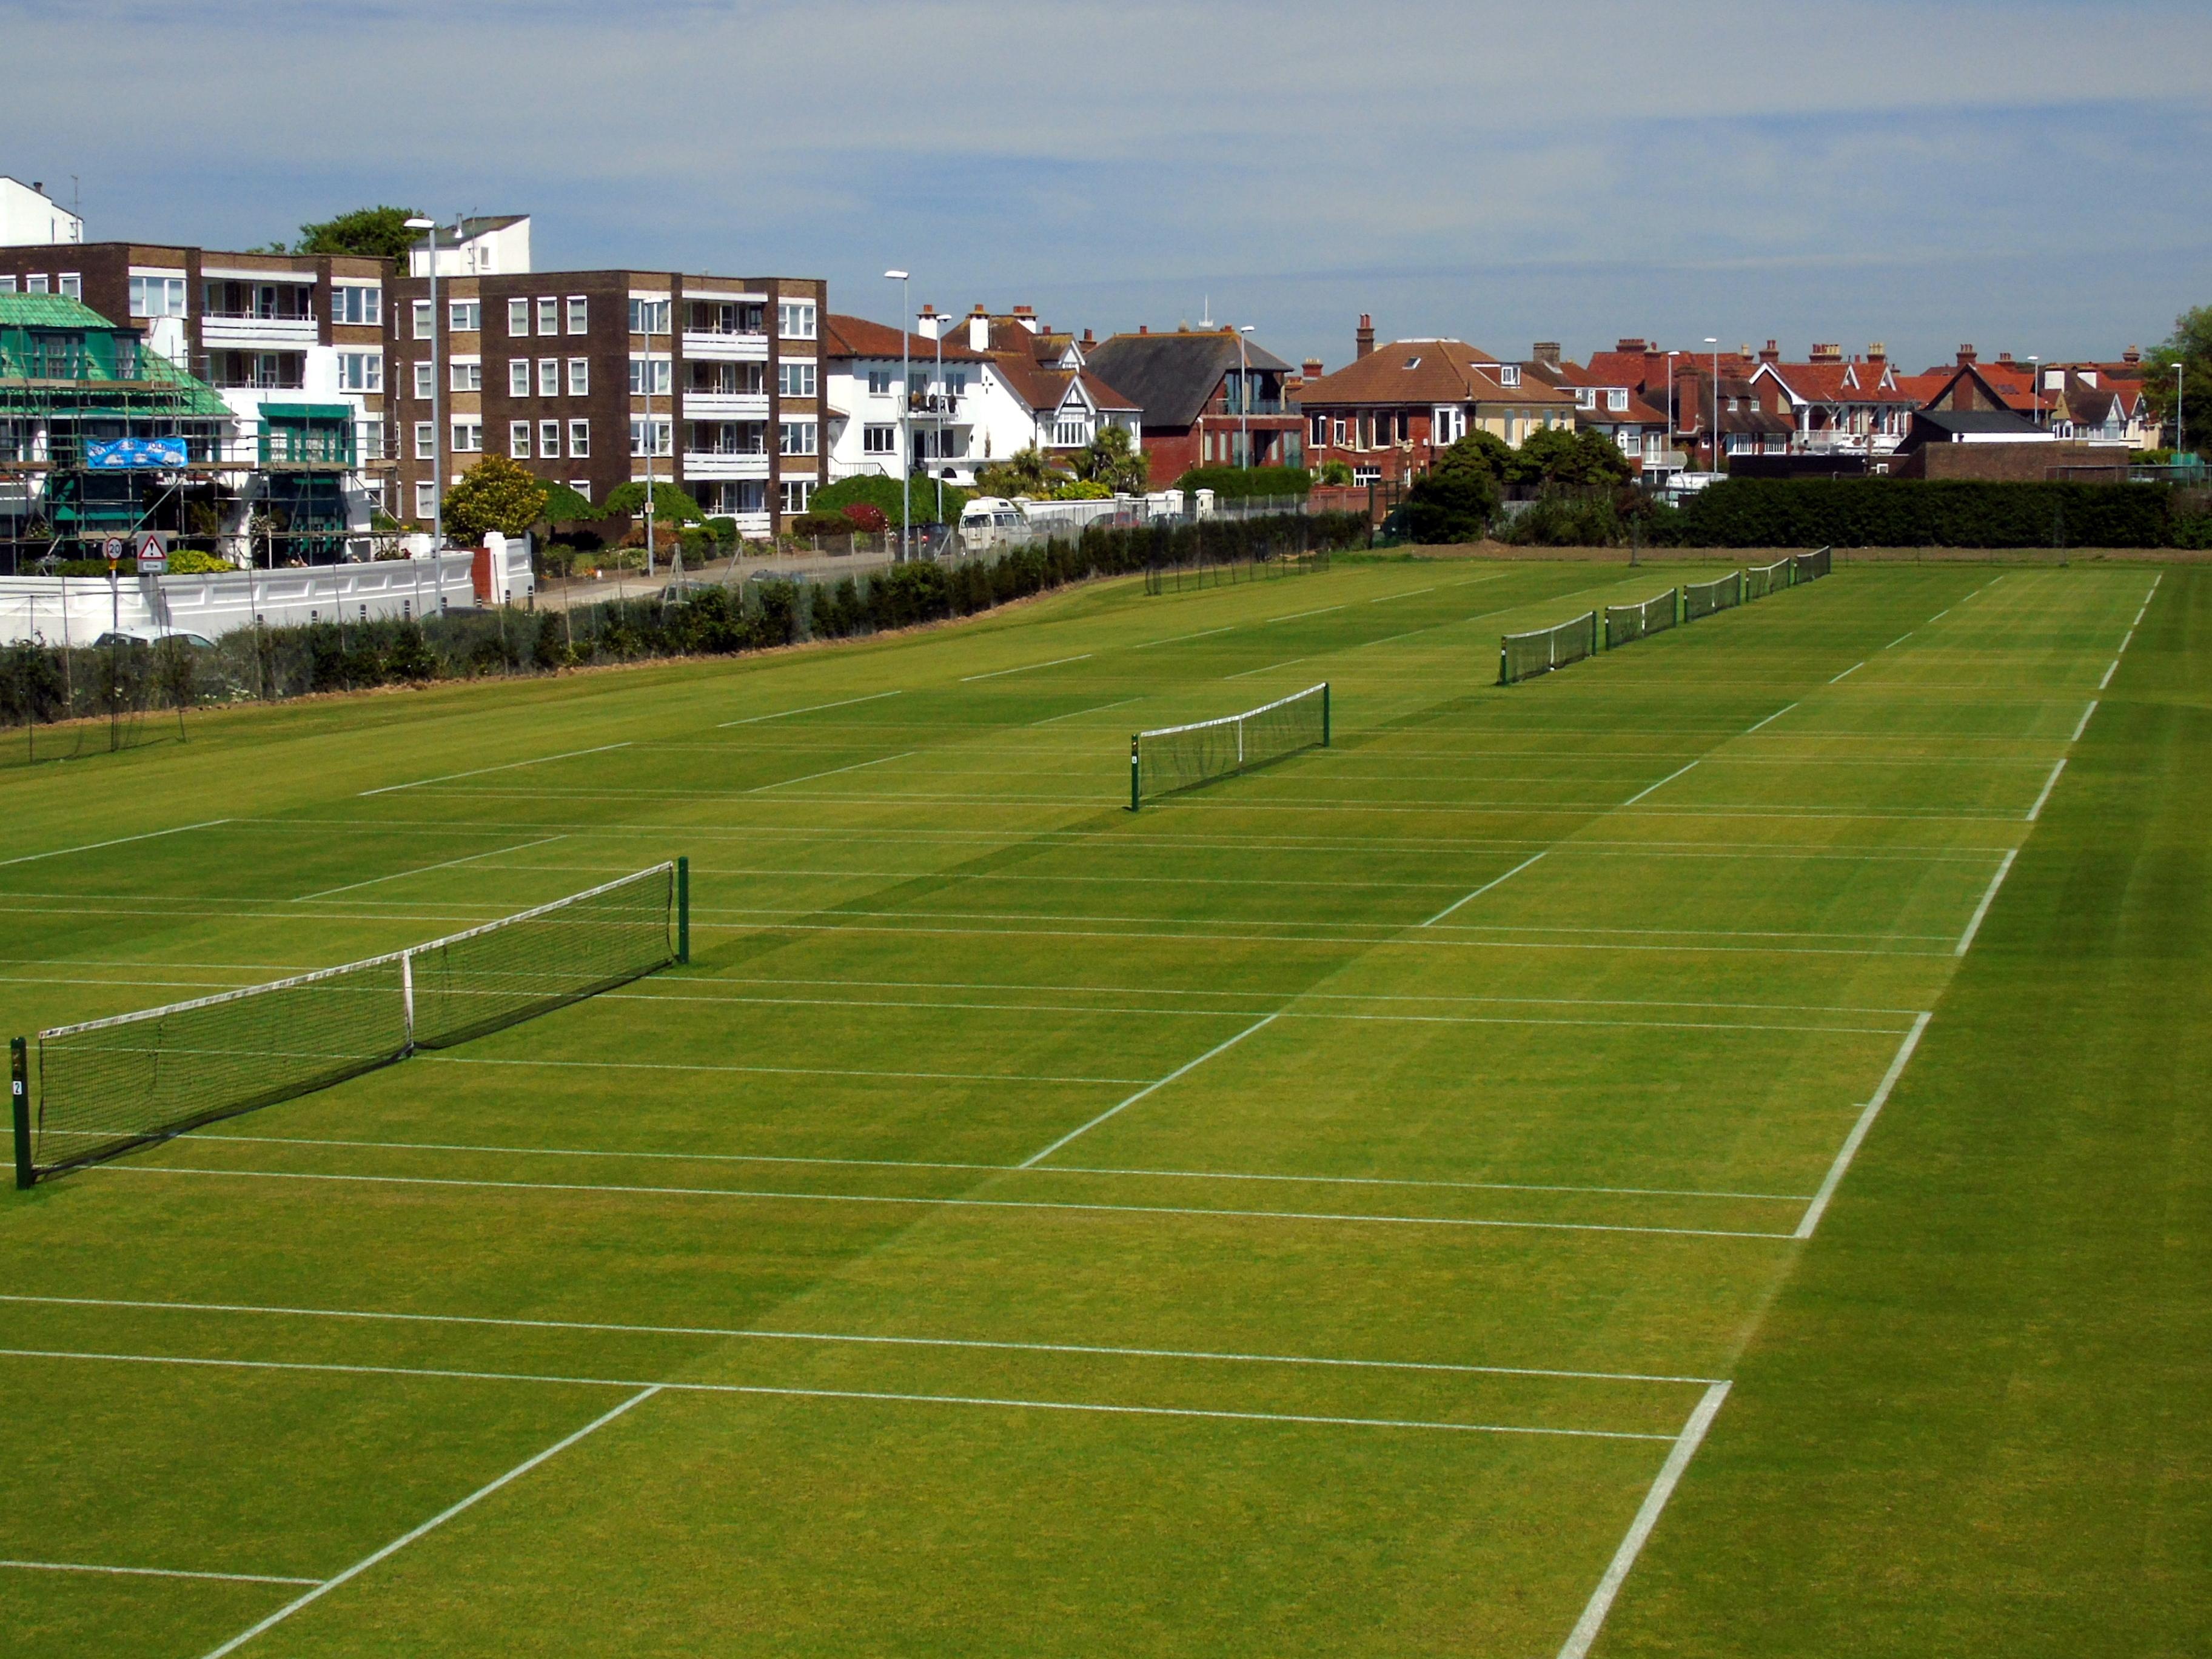 grass courts (2)